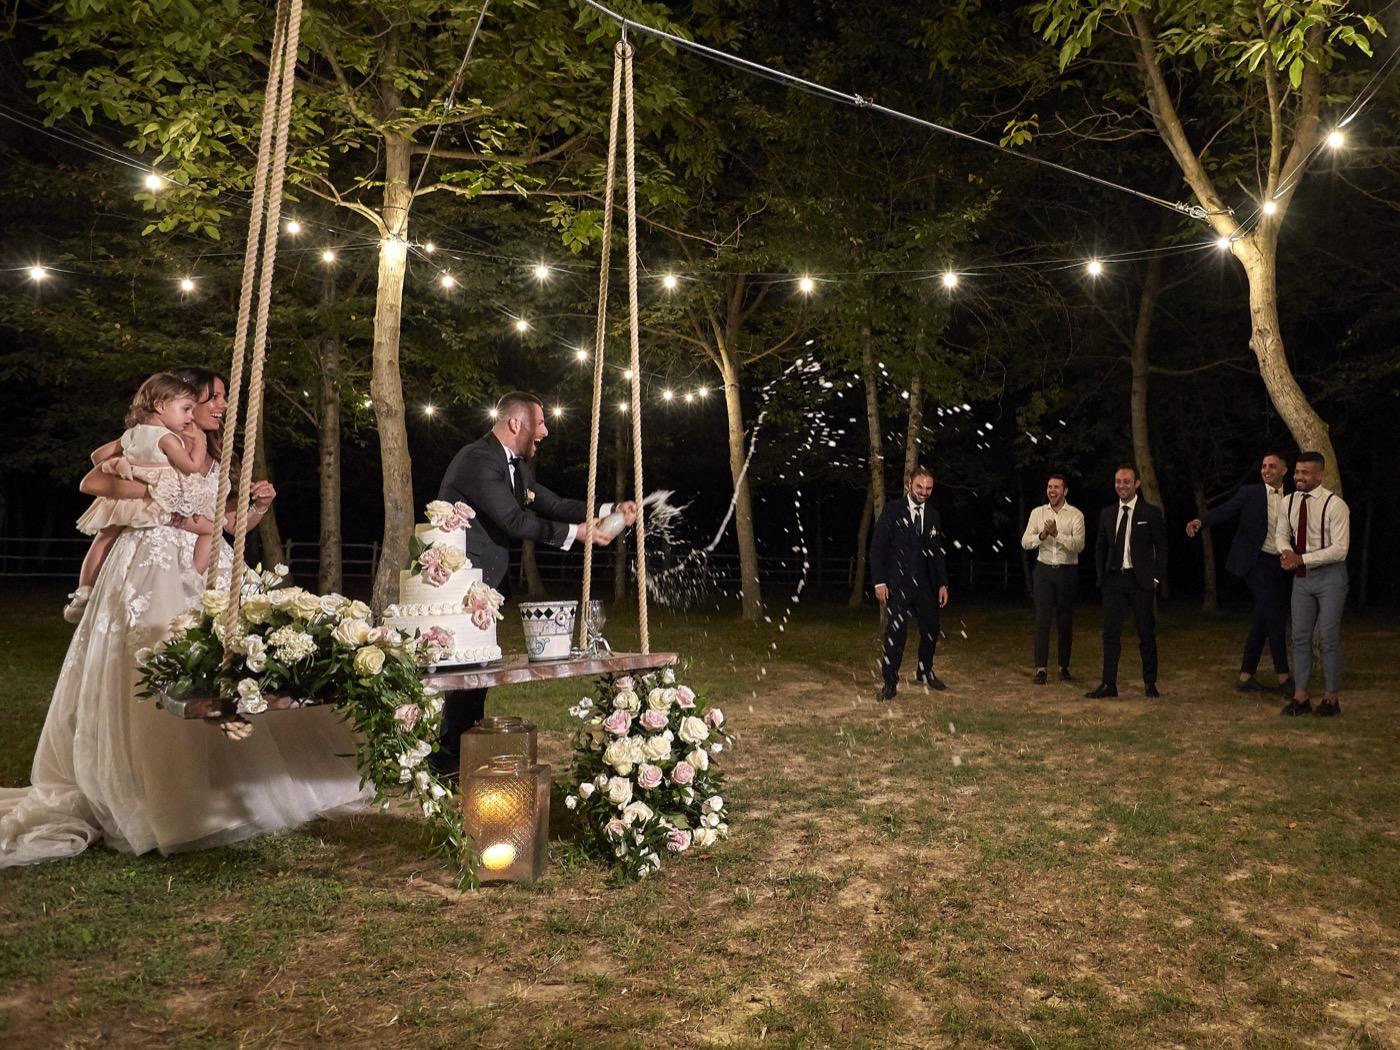 Claudio-Coppola-wedding-photographer-la-scuderia-eventi-preparativi-la-rosetta-perugia-91